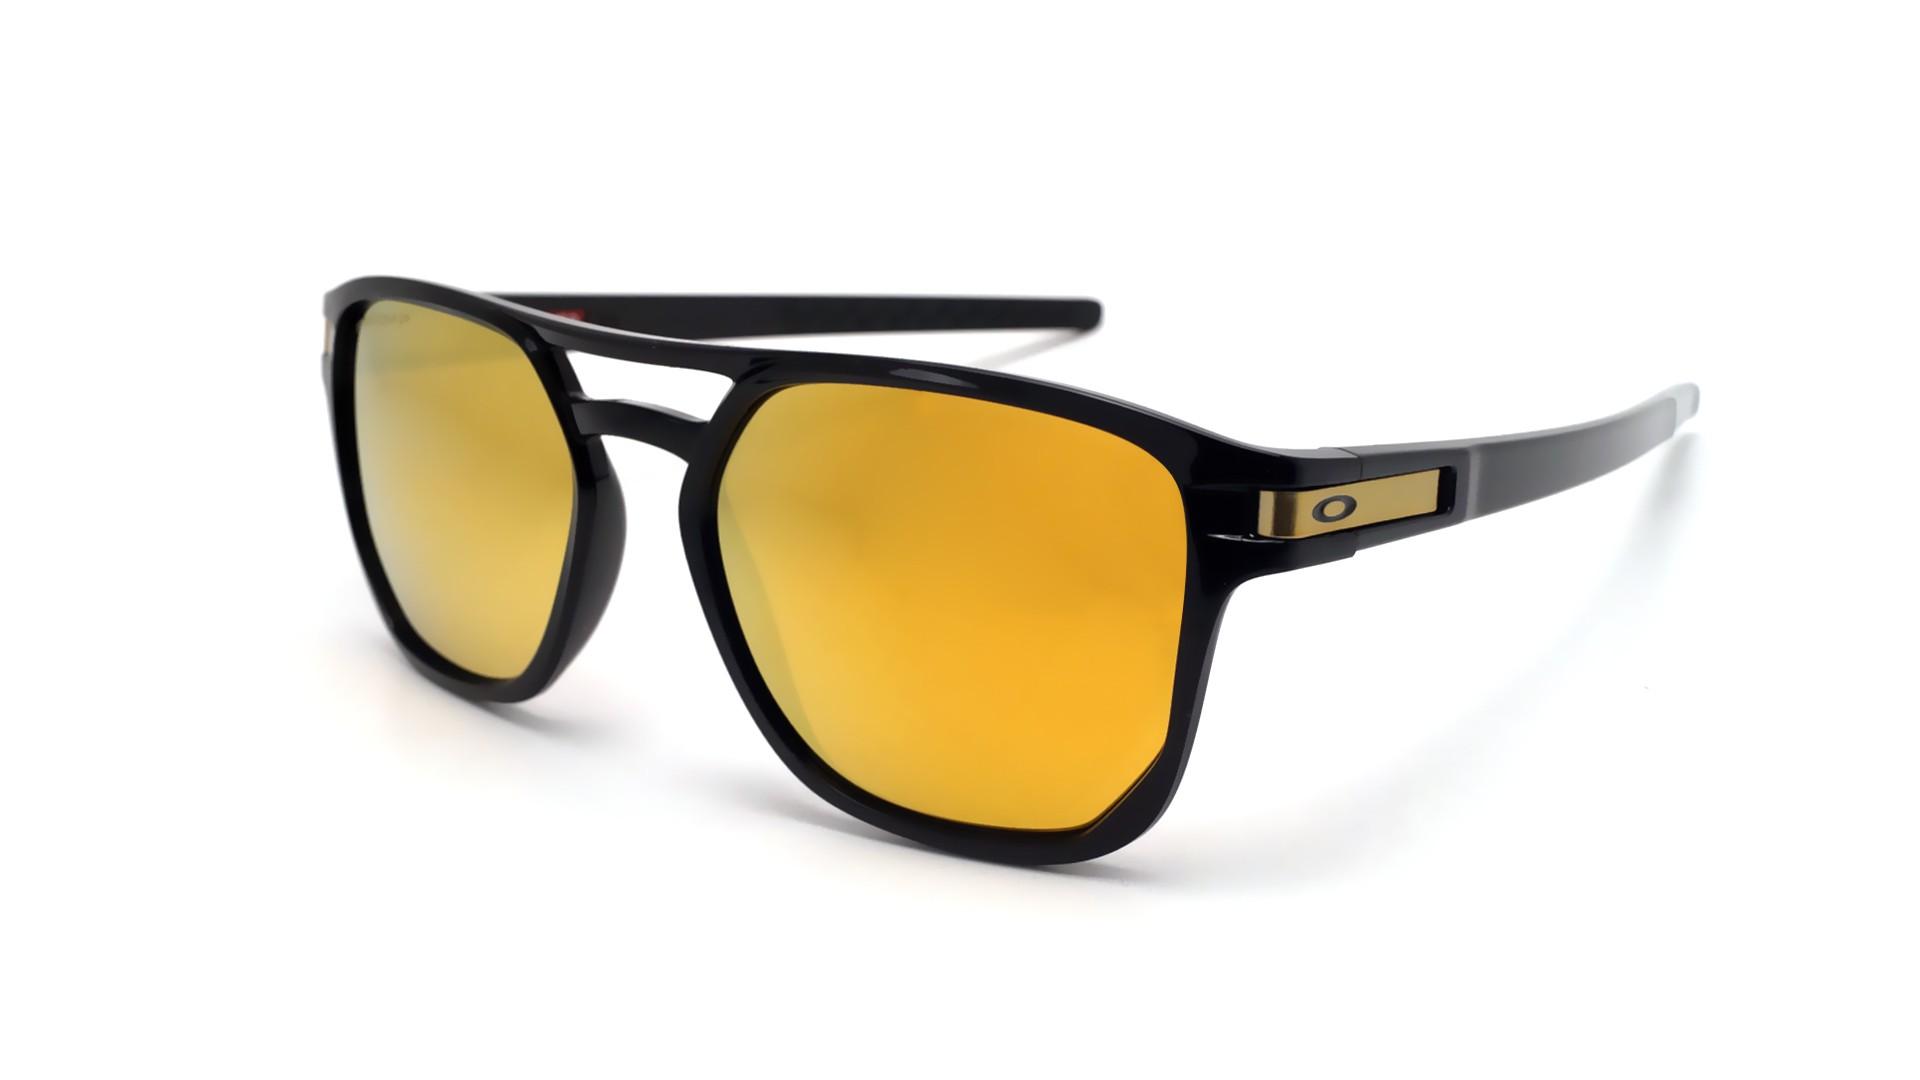 7aa60d080c9 closeout oakley latch beta sunglasses olive ink f86c0 d500e  50% off sunglasses  oakley latch beta black prizm oo9436 04 54 18 medium polarized flash